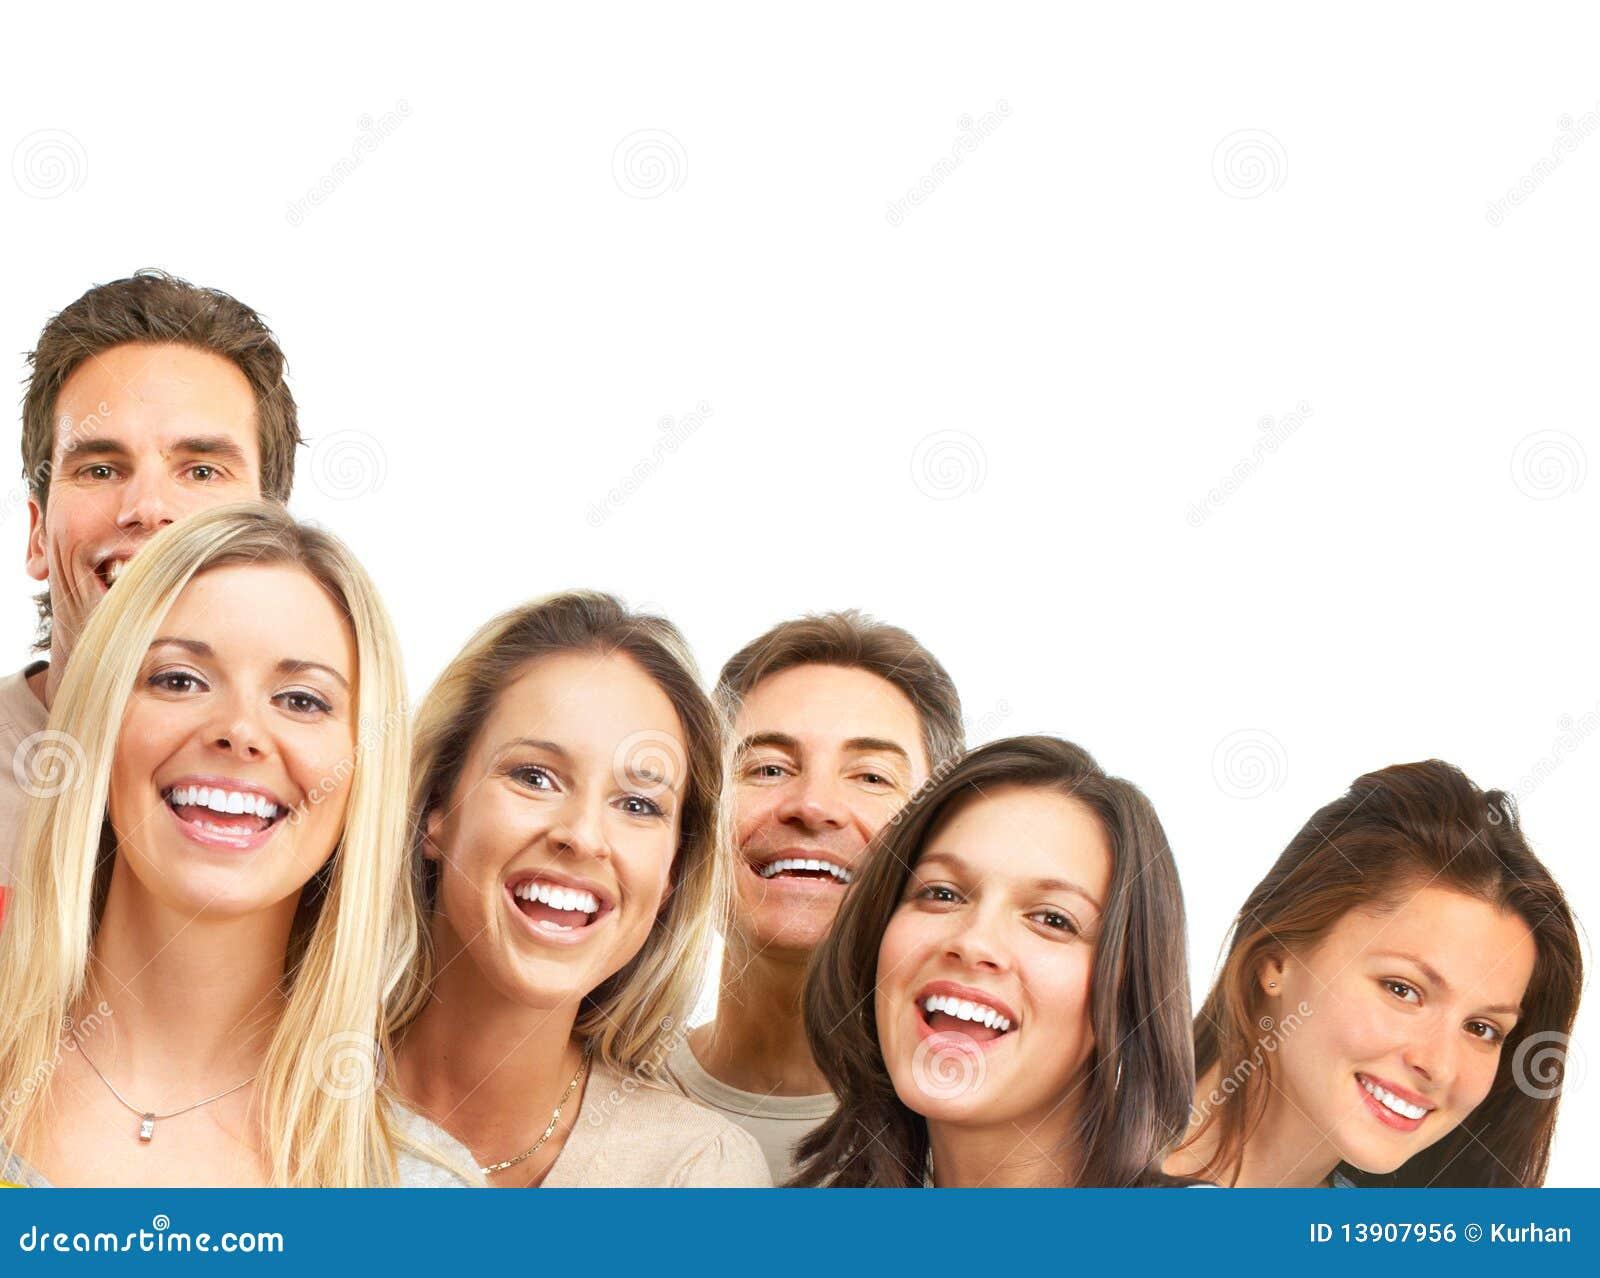 stock image of people - photo #27